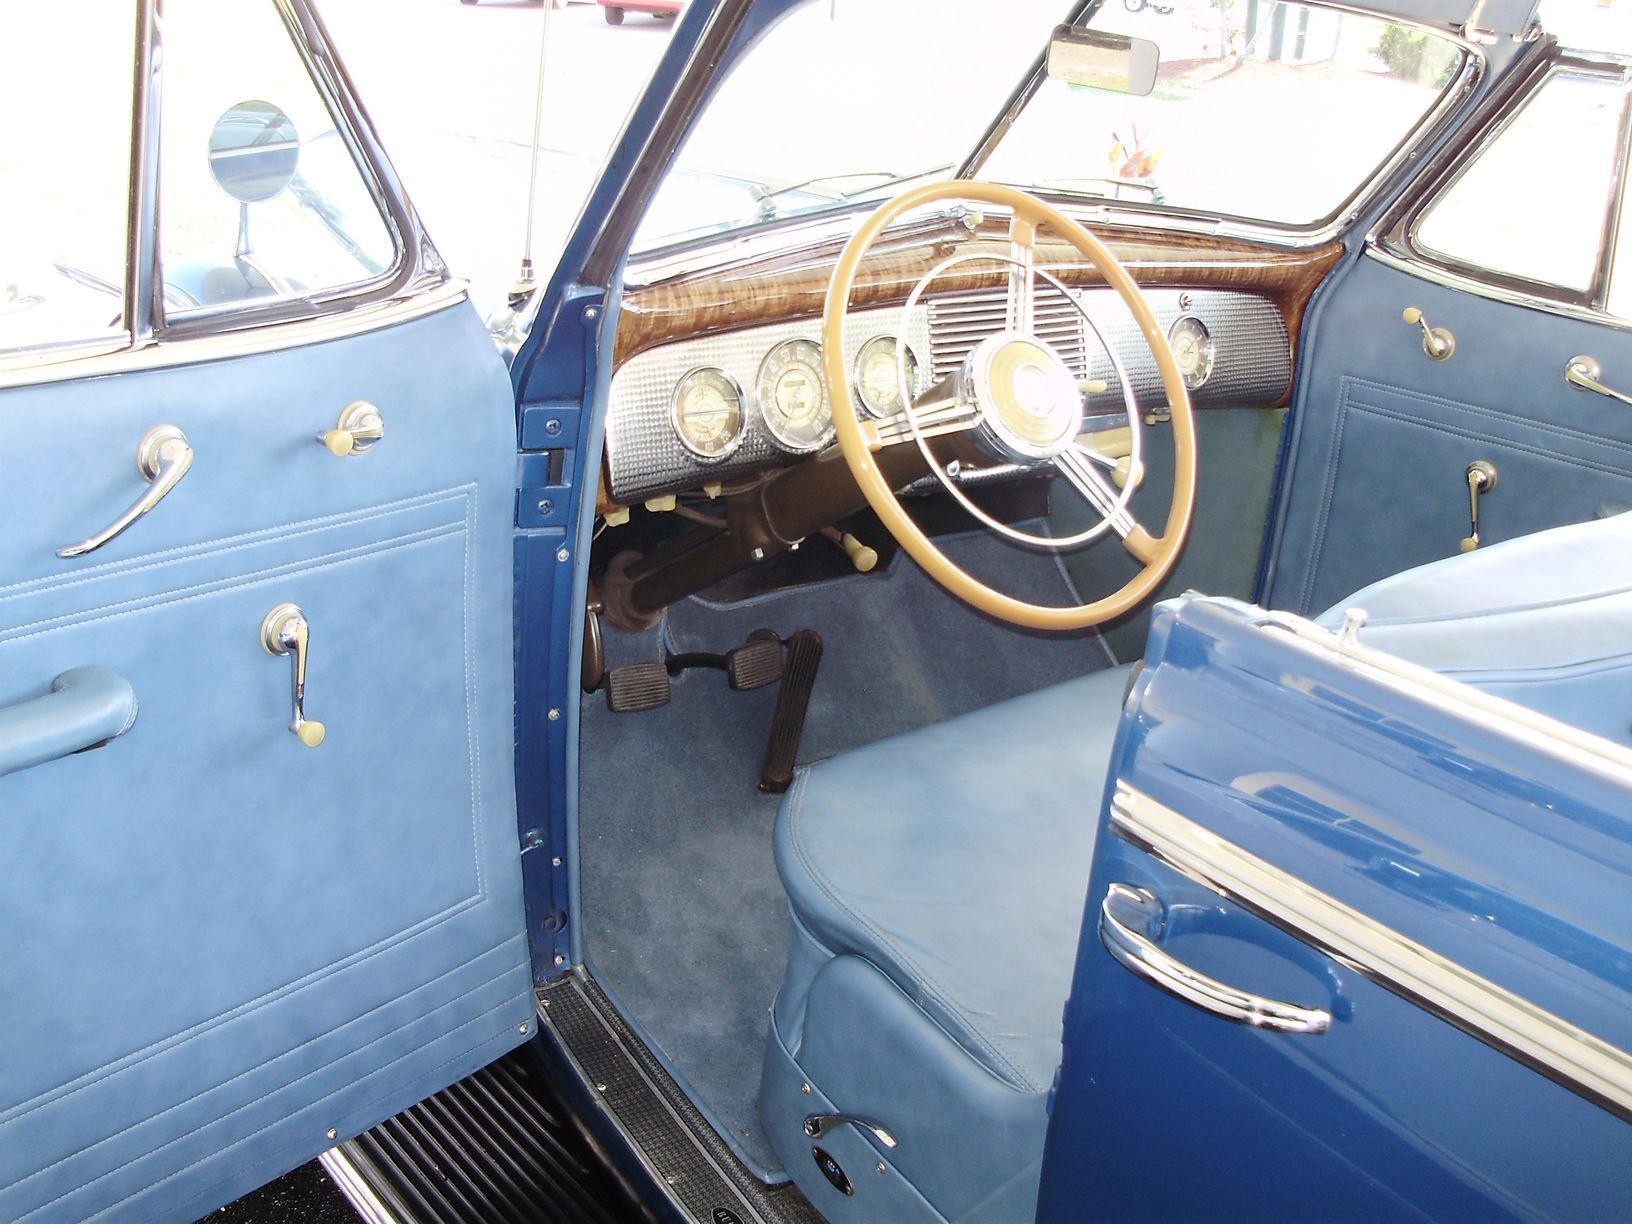 1940 BUICK CENTURY CONVERTIBLE SEDAN - Vintage Motors of Sarasota Inc. #24